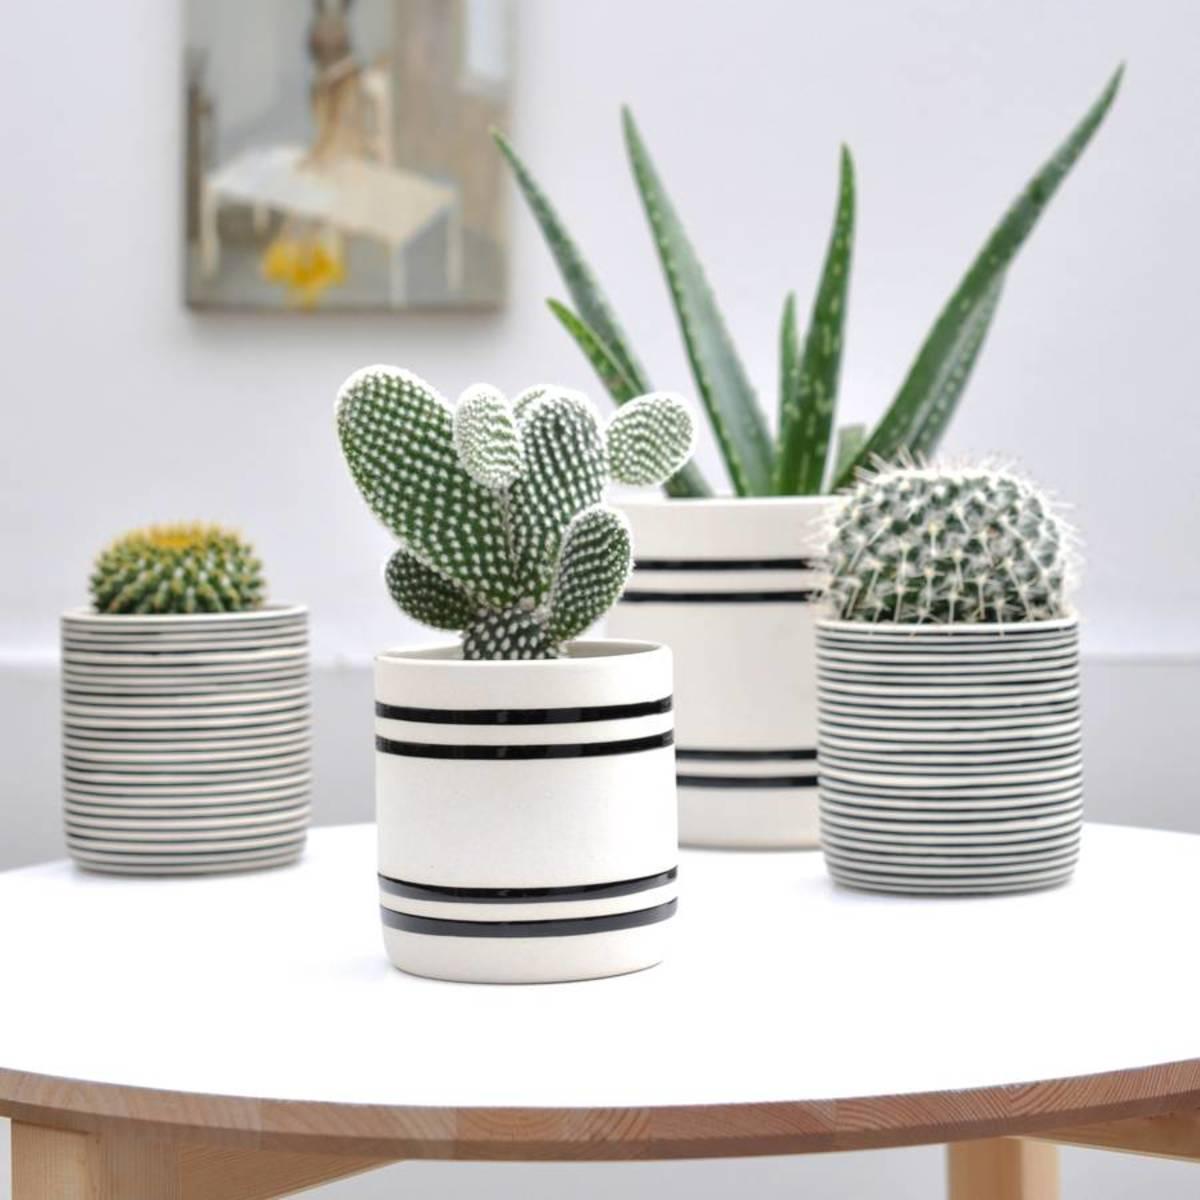 henry-future-faja-handcrafted-pot